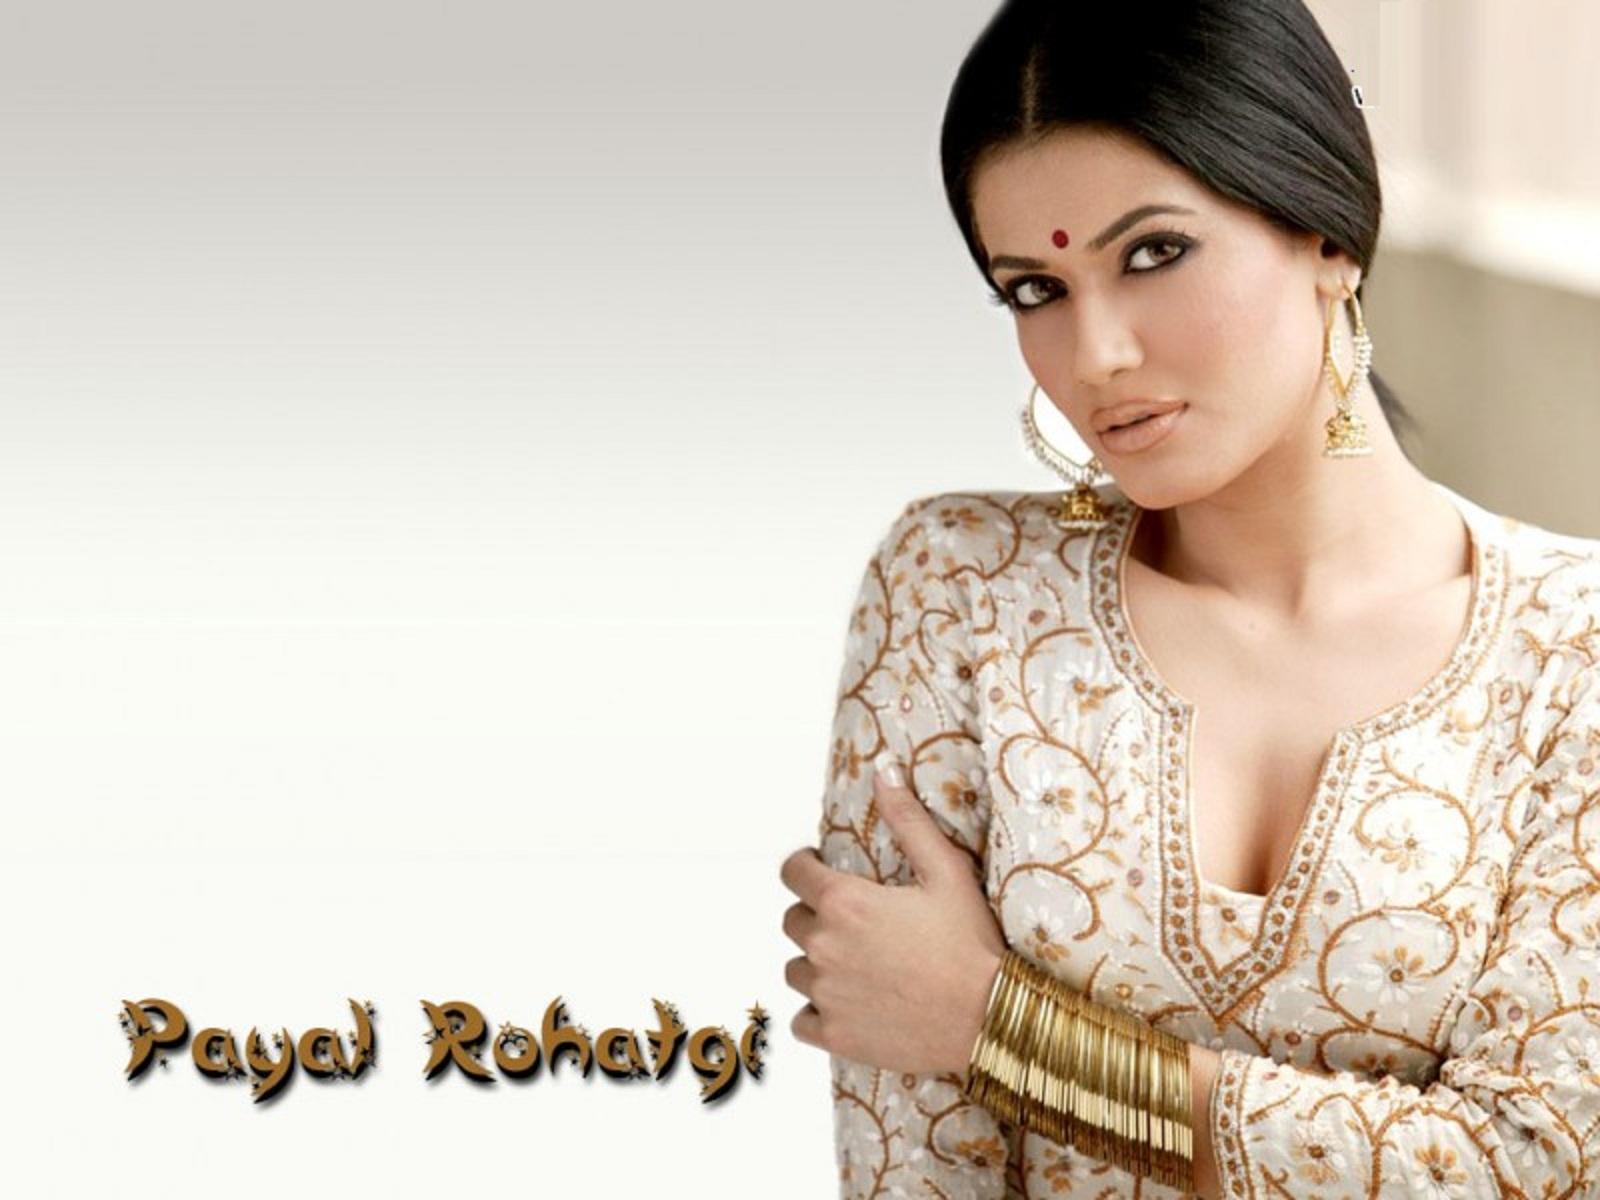 beautiful payal rohatgi hd wallpaper - all 4u stars wallpaper